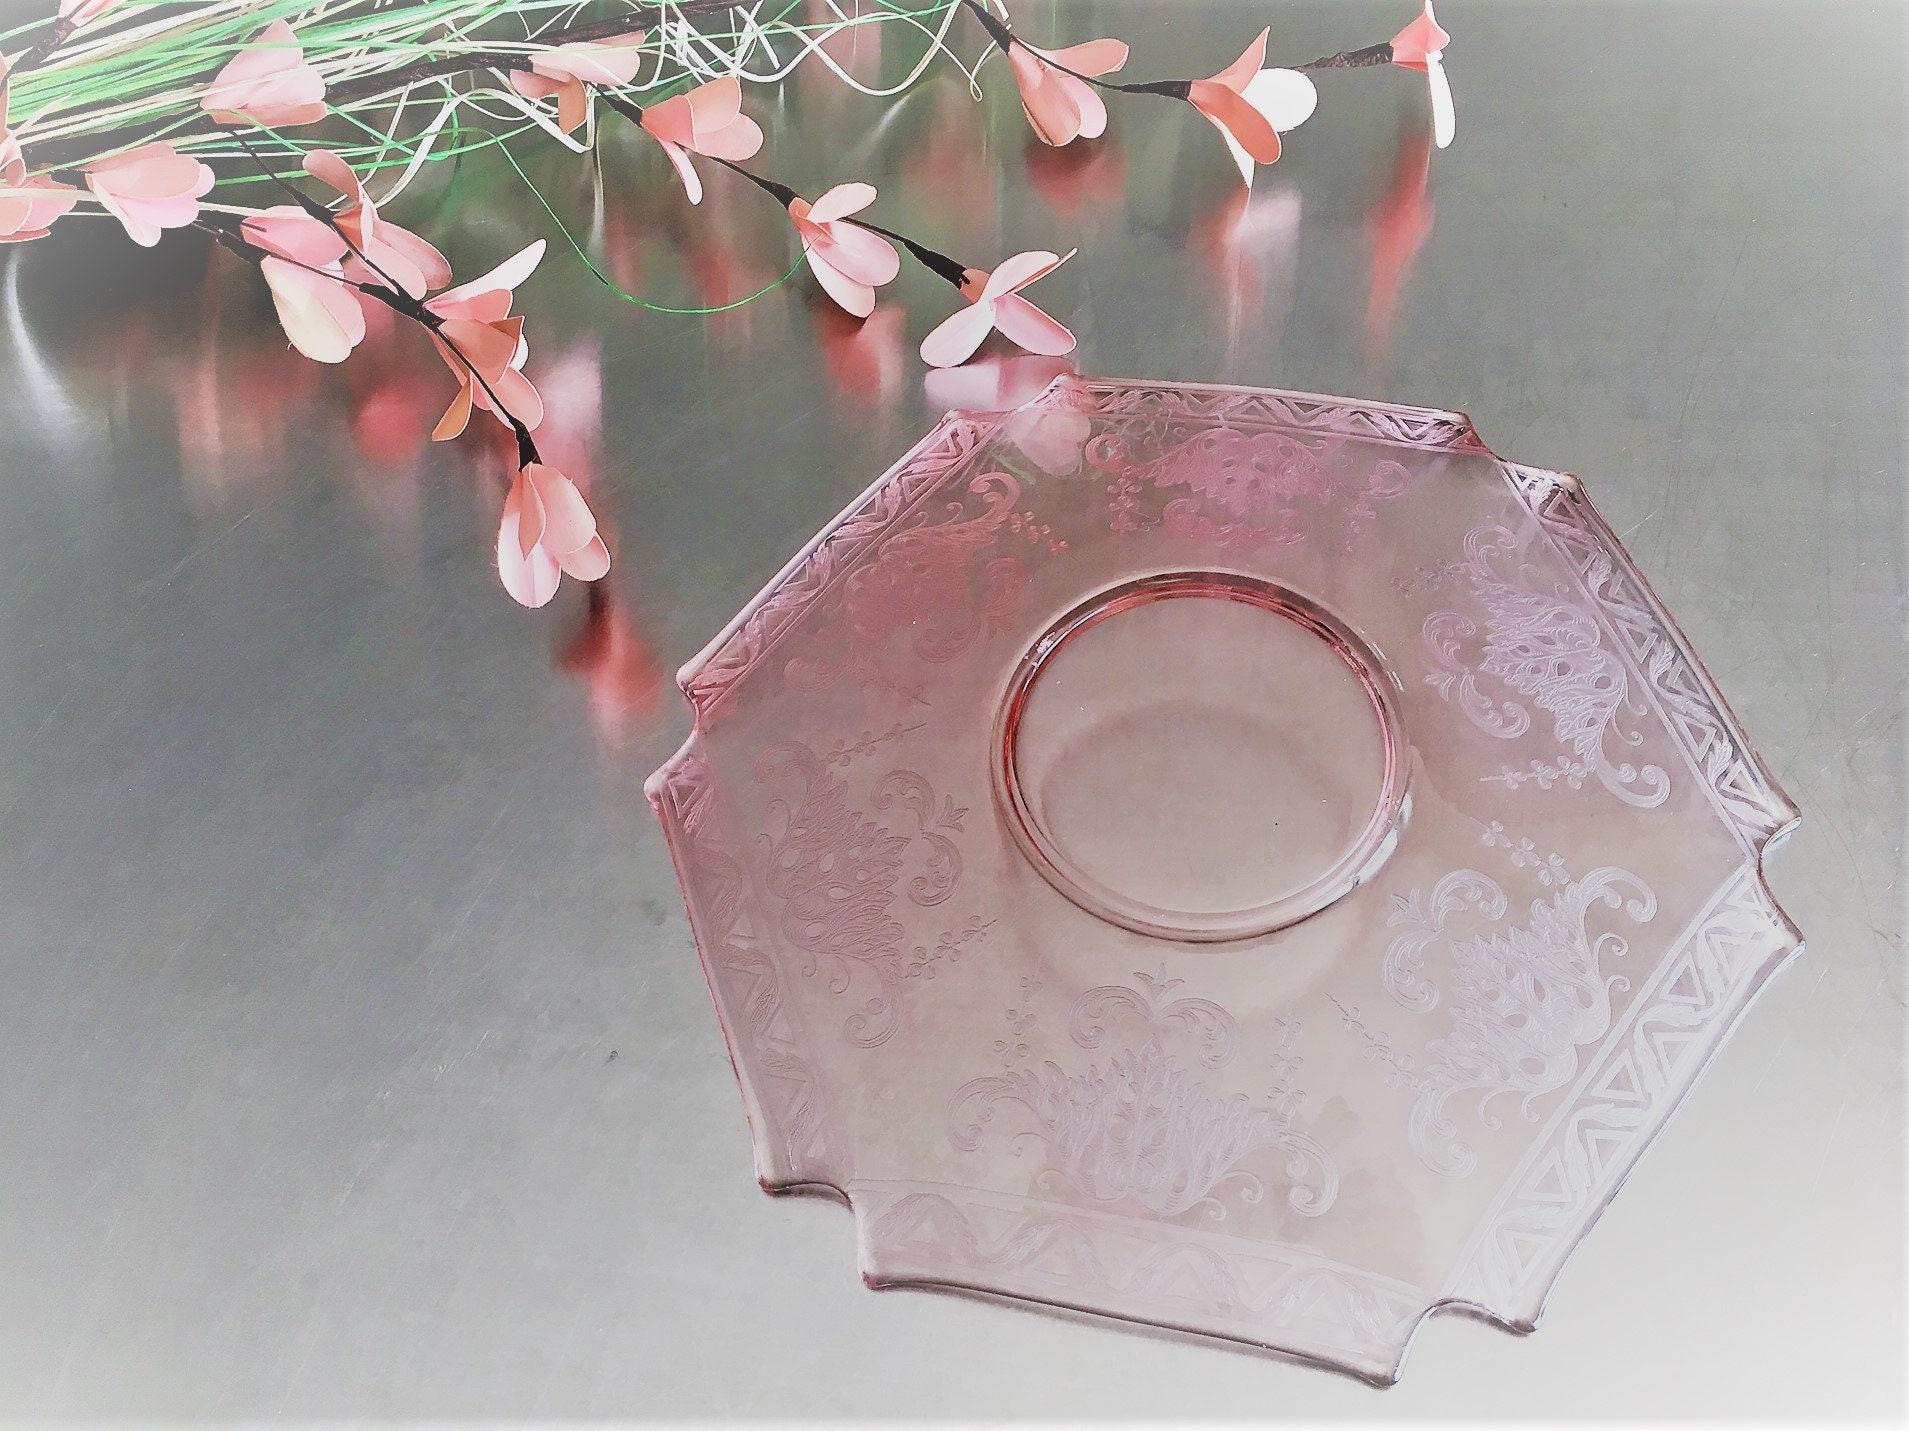 Rare Pink Depression Glass Plate - New Martinsville ...